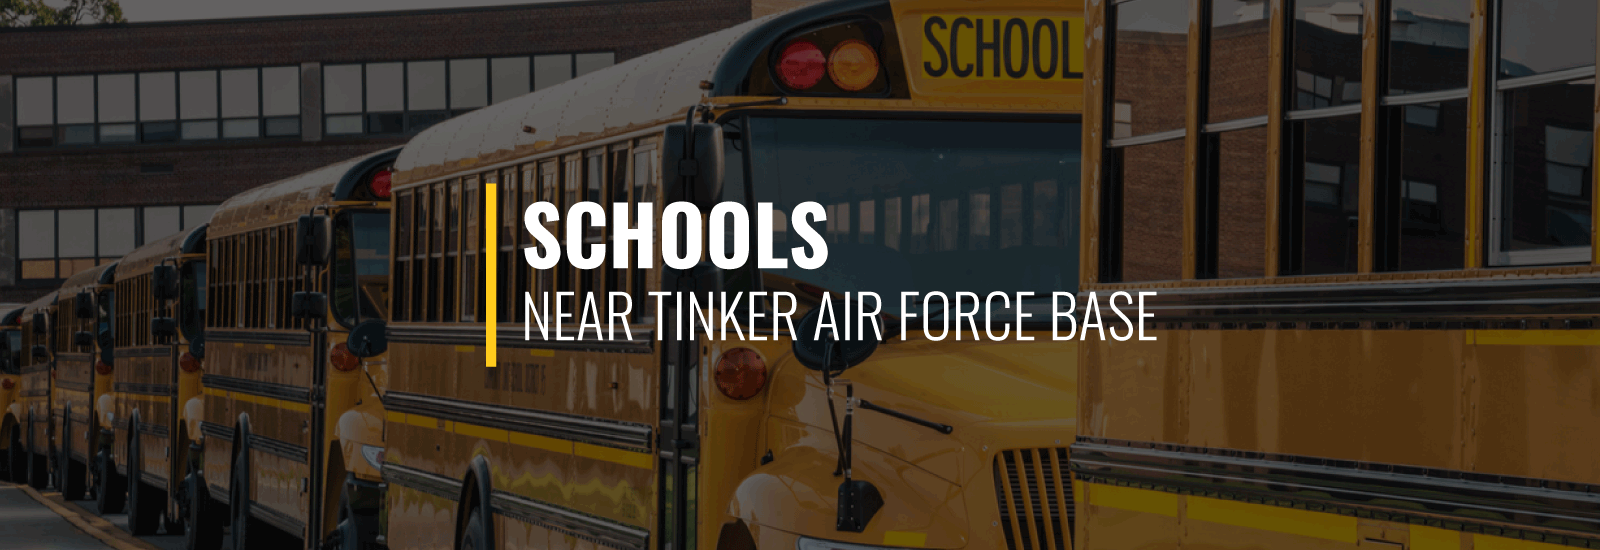 Tinker AFB Schools